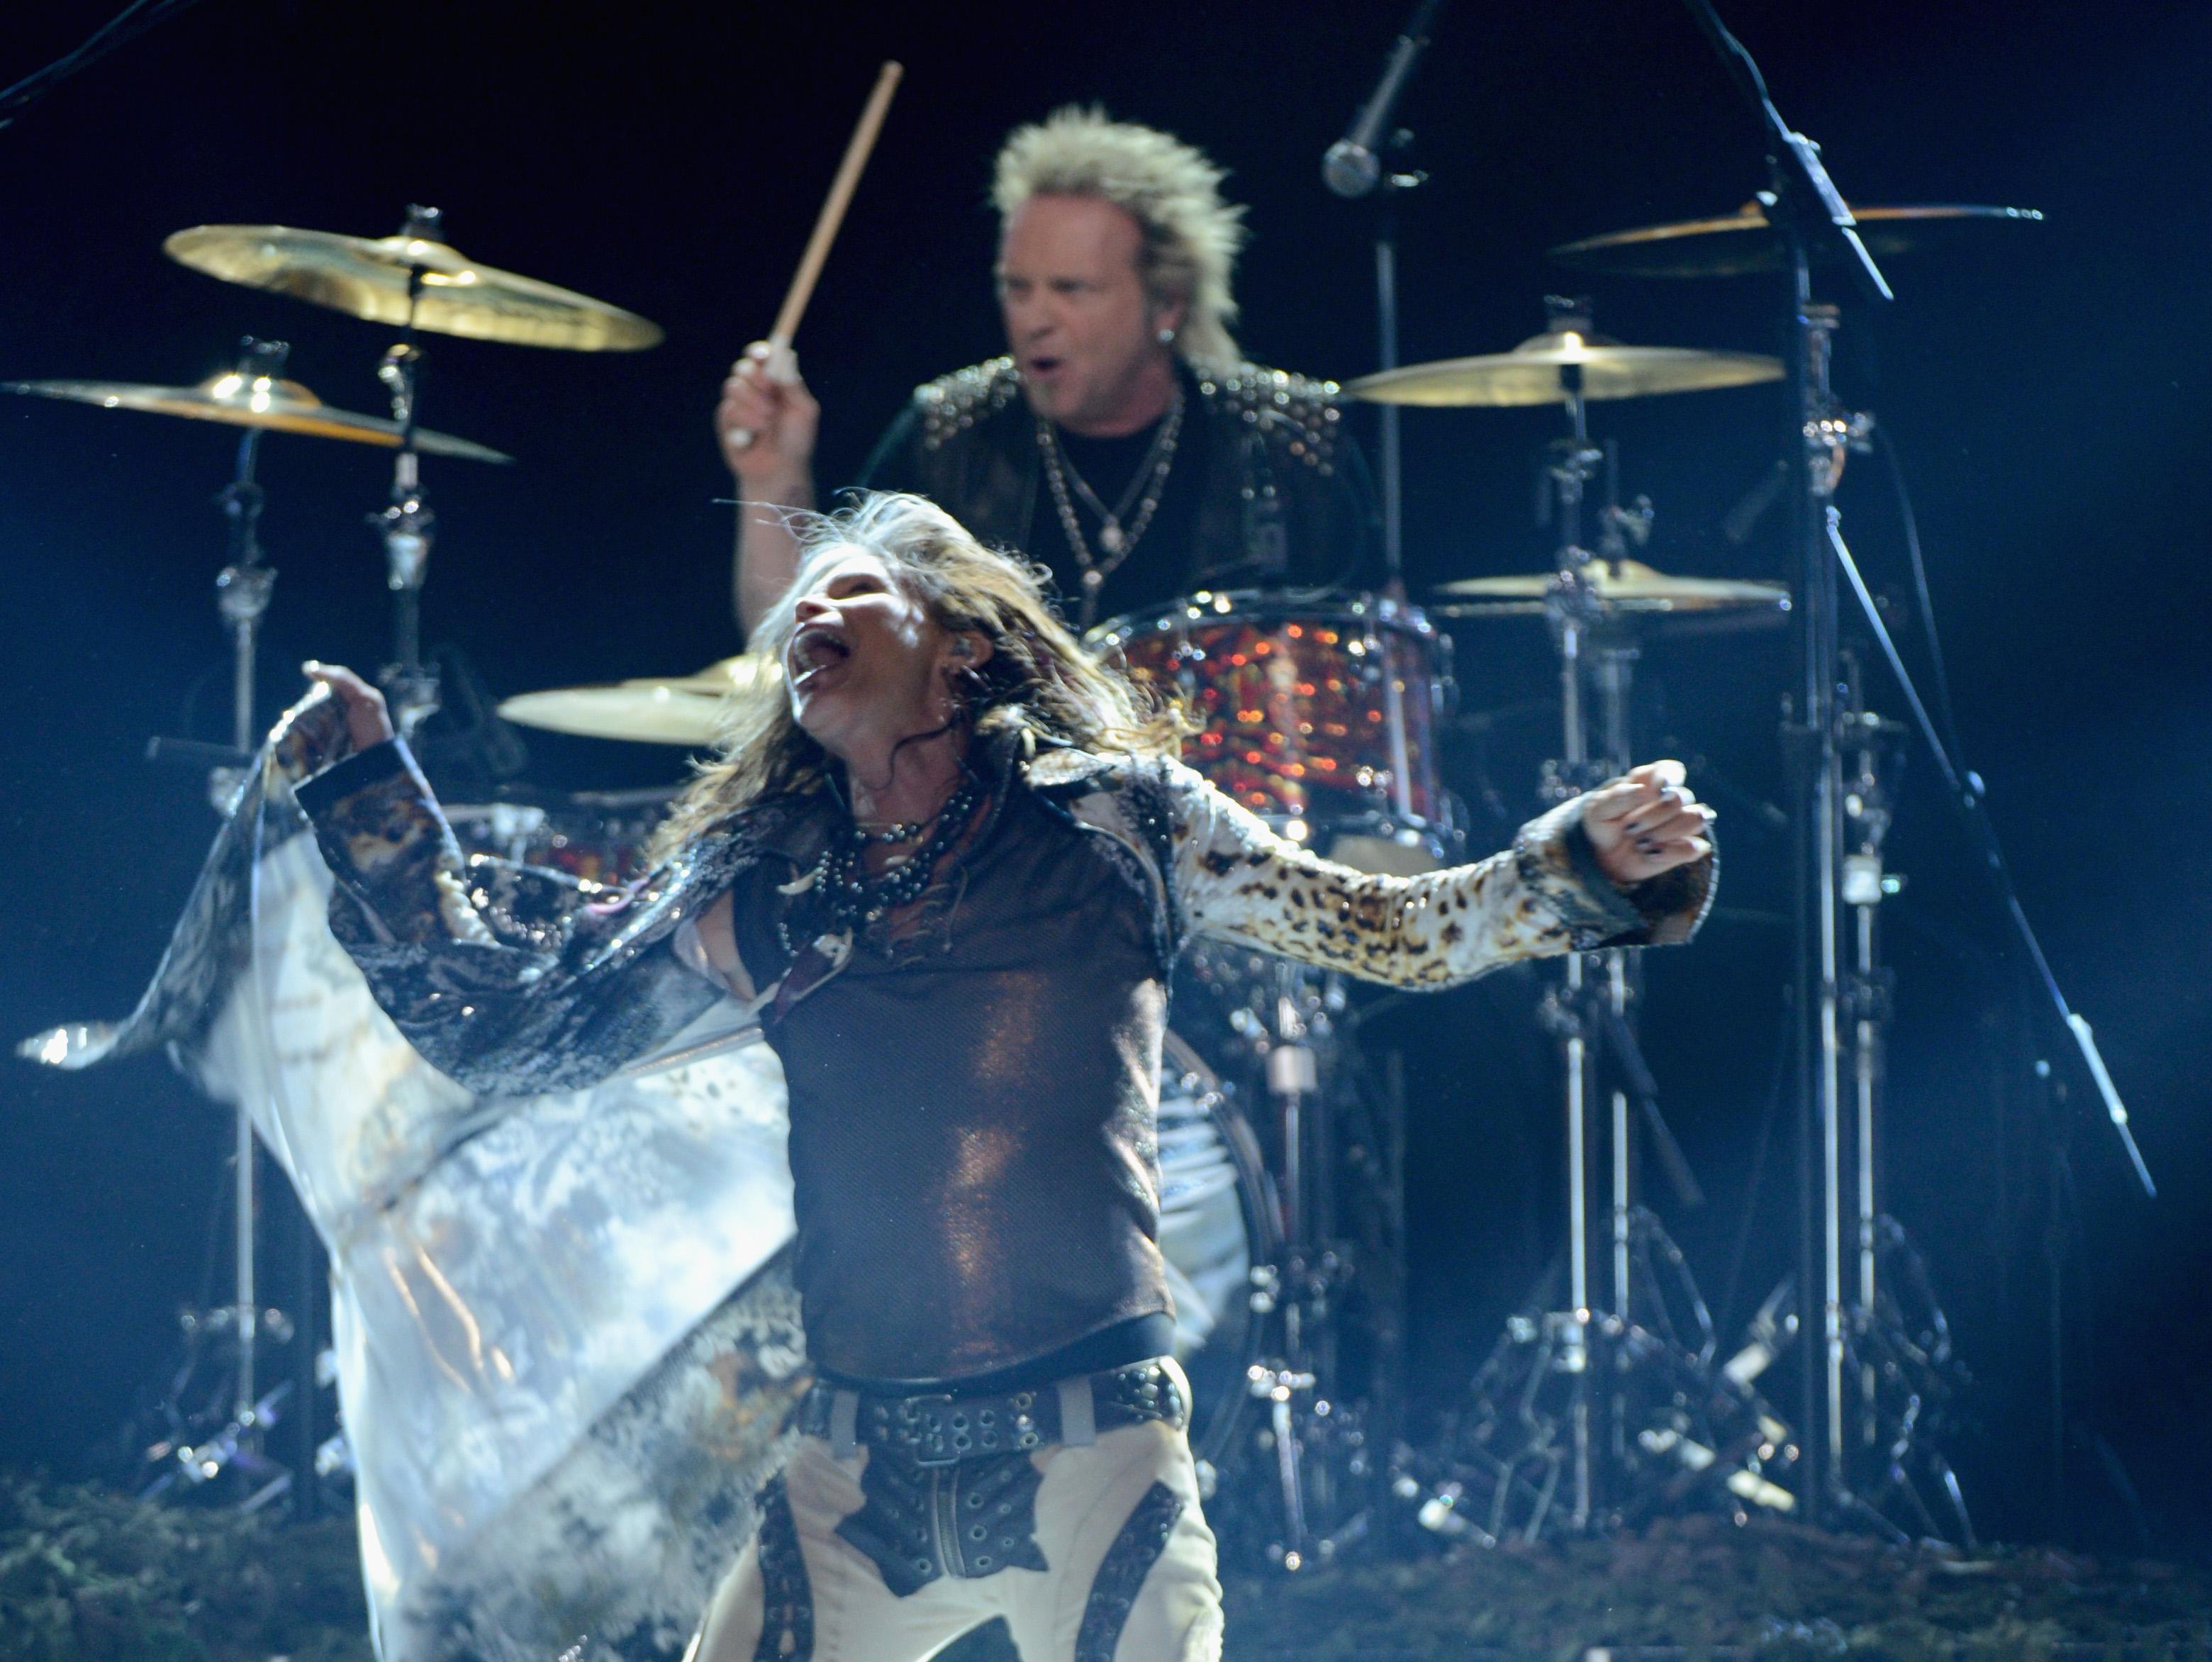 Aerosmith's Joey Kramer Opens Up About Heart Procedure